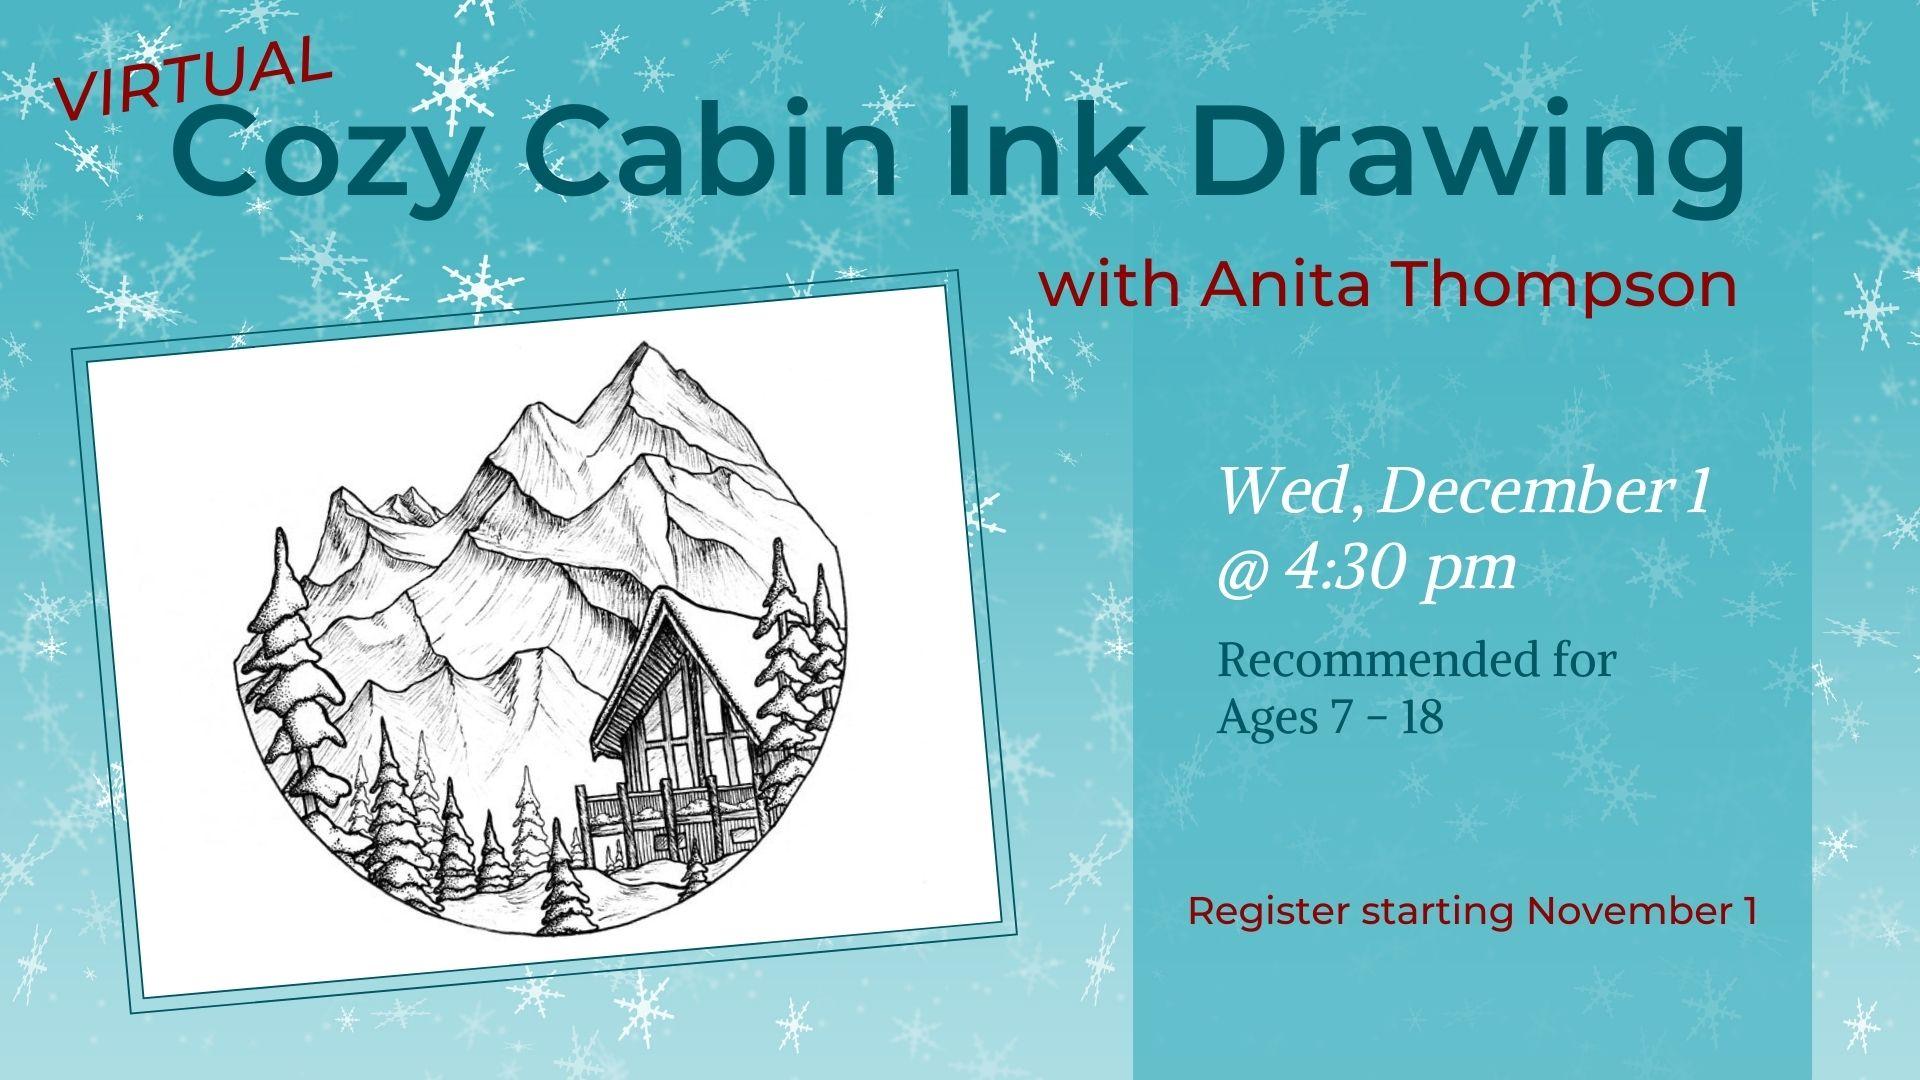 Cozy Cabin Ink Drawing